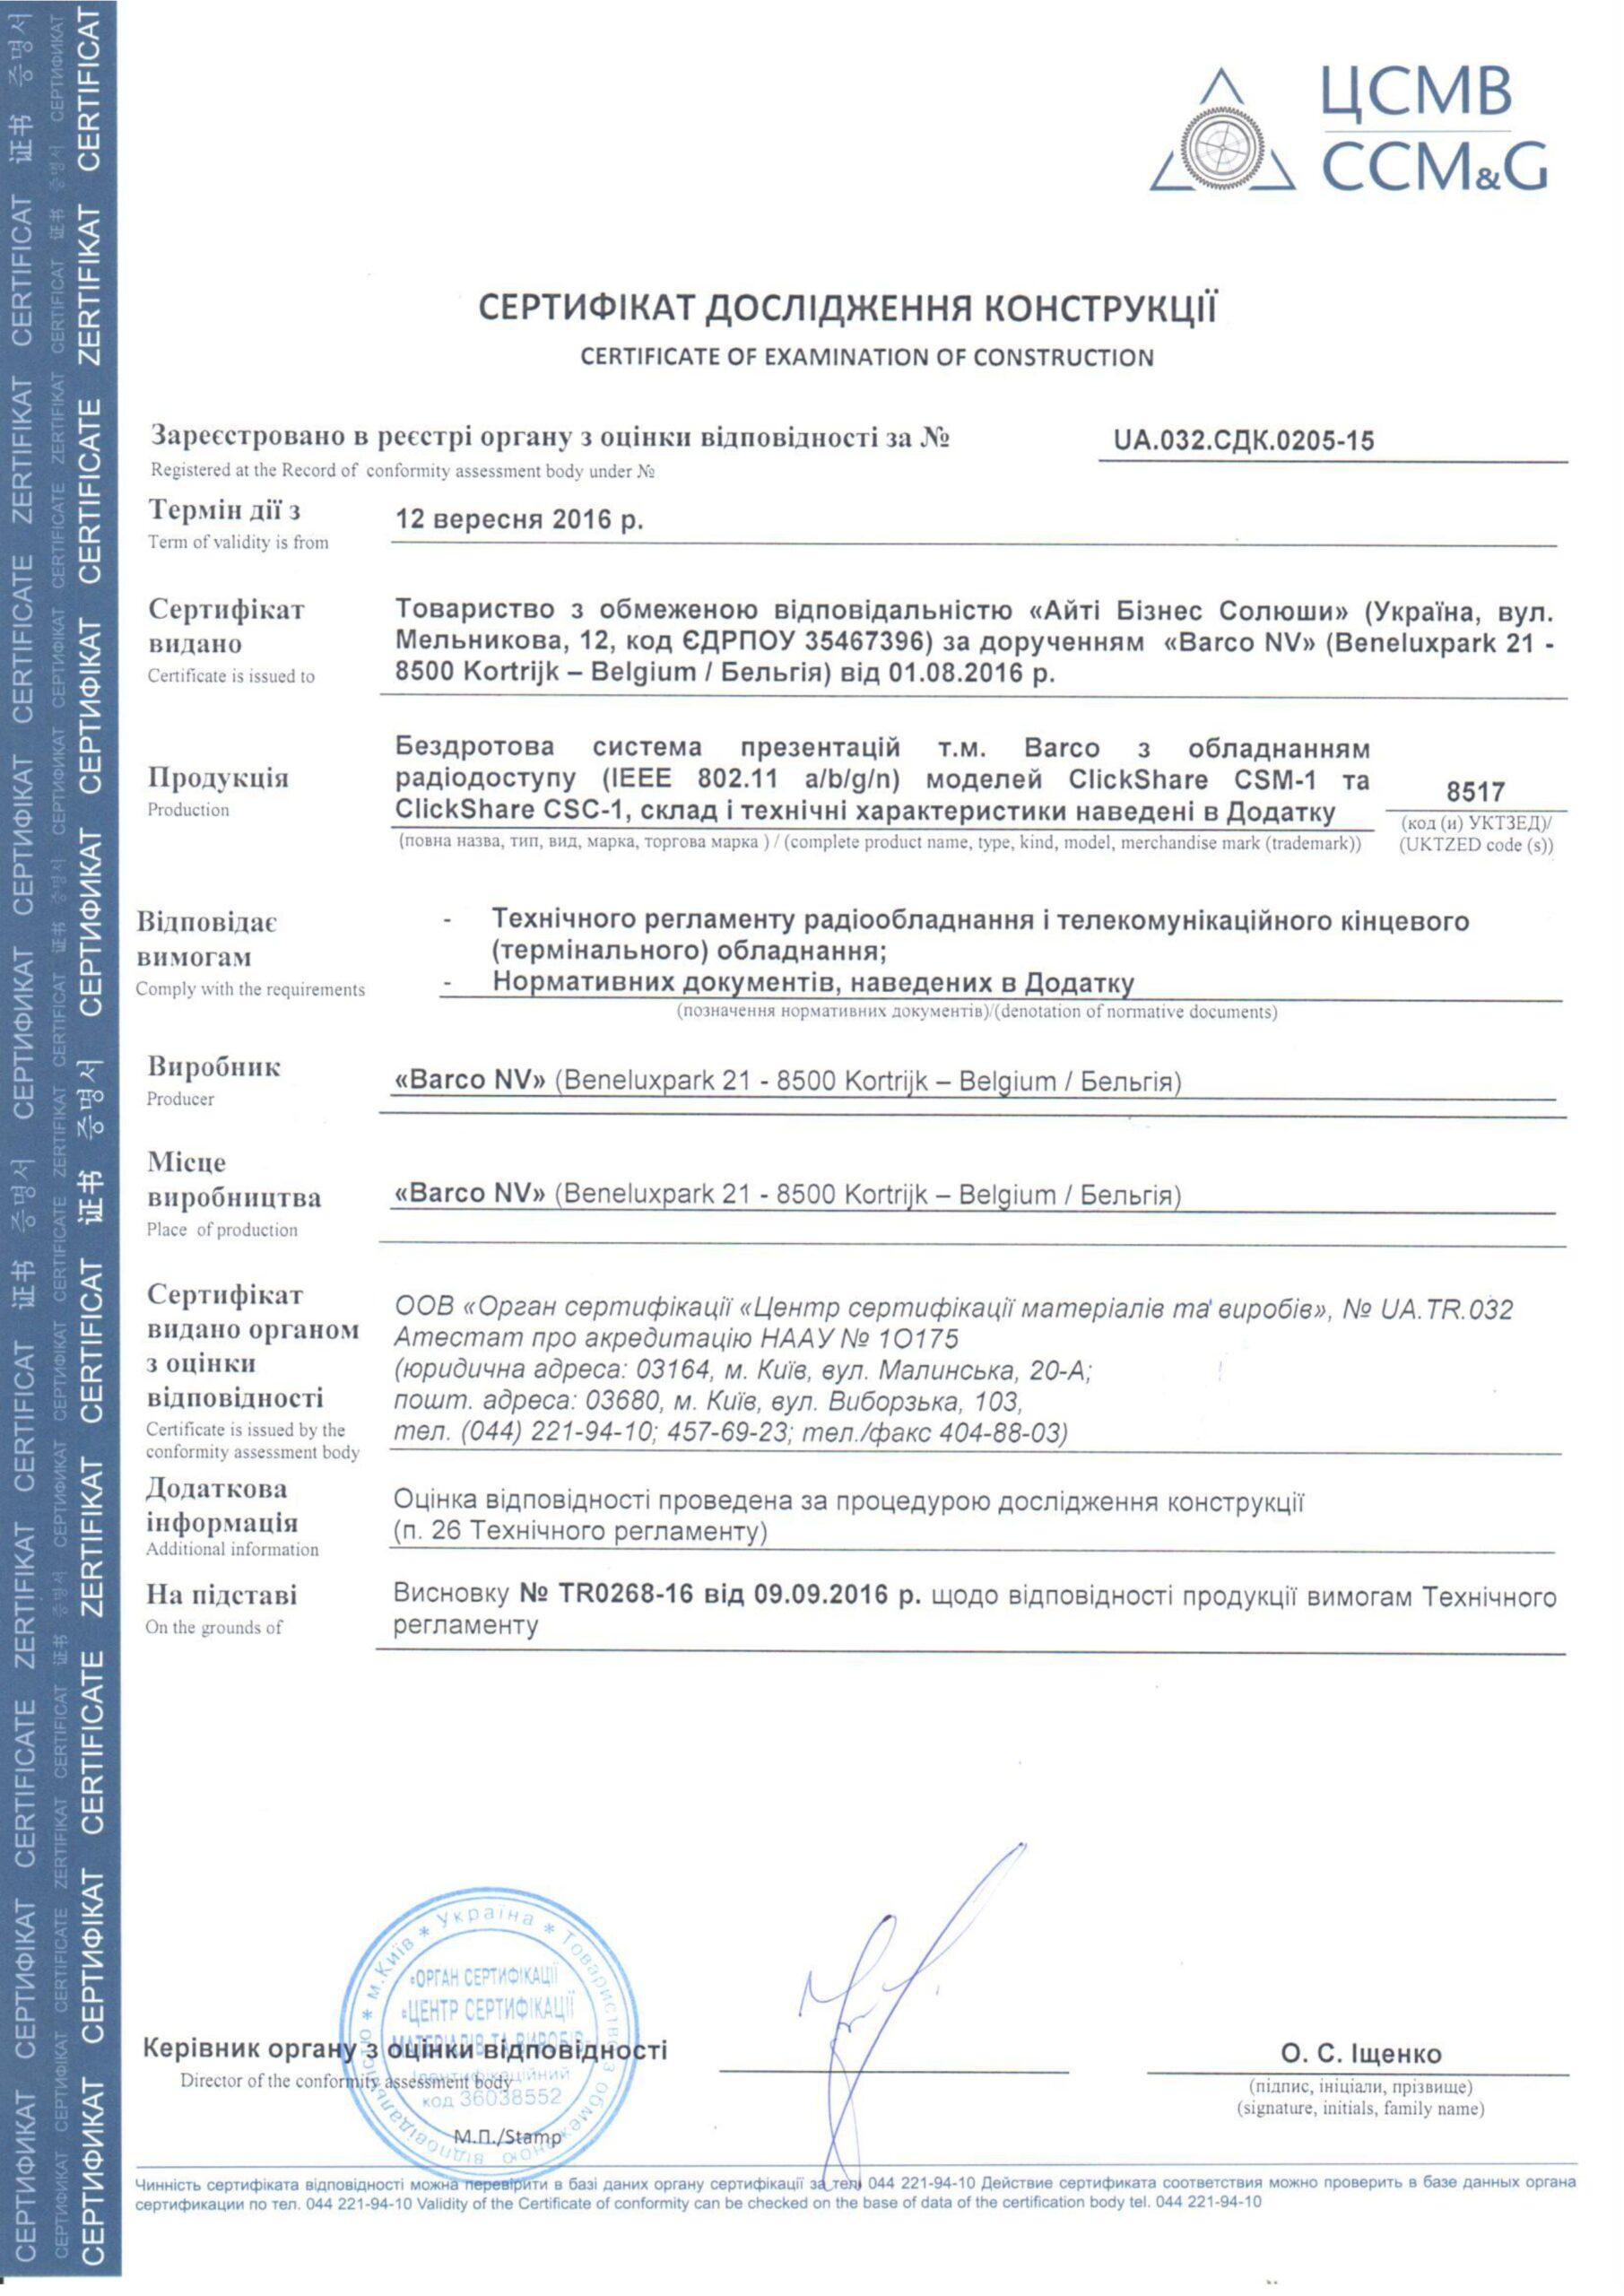 sertifikate1